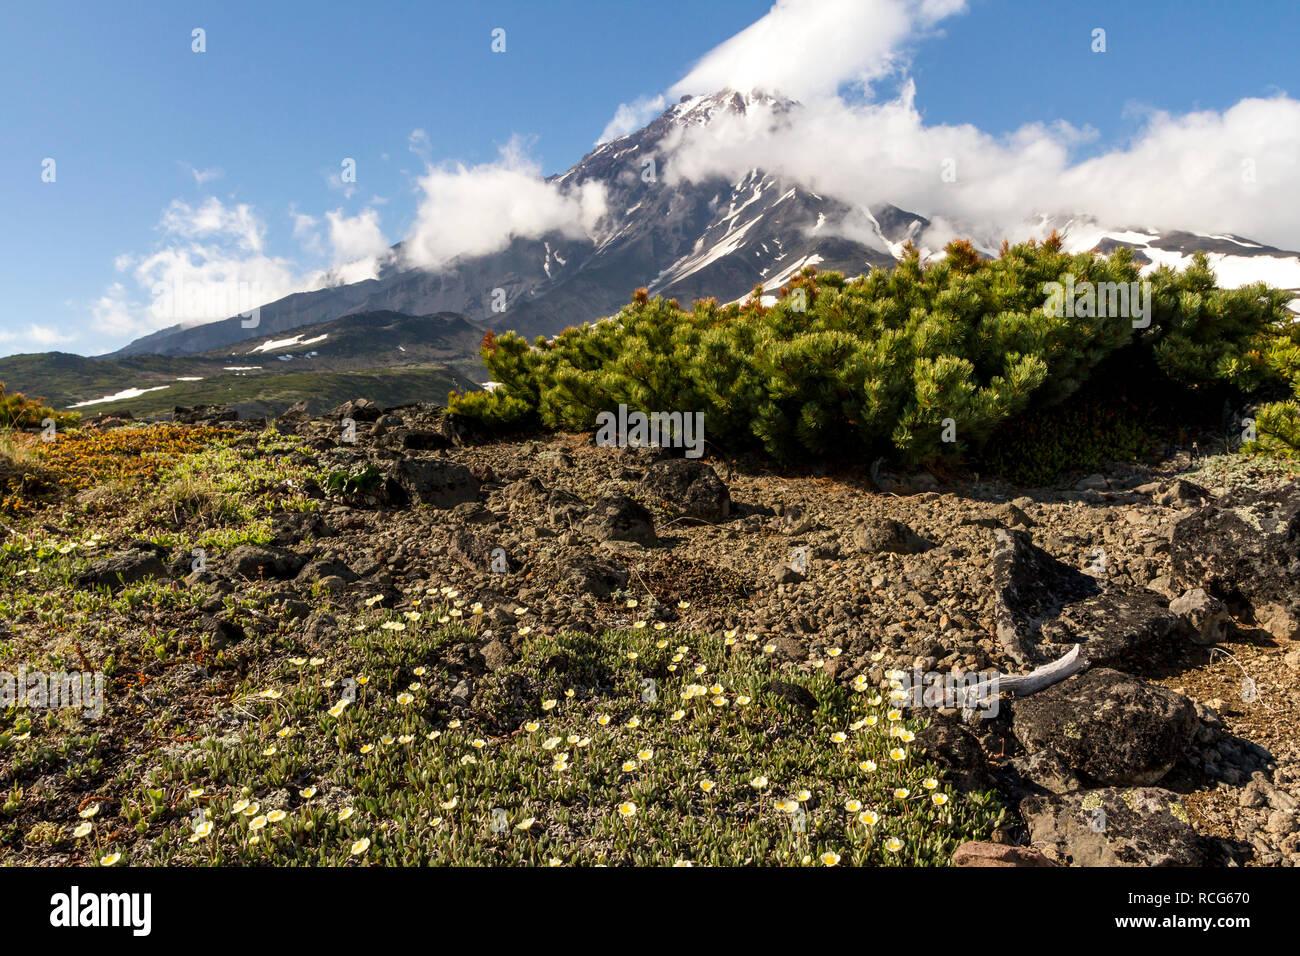 View of the stratovolcano Volcano Koryaksky, Kamchatka Peninsula, Russia - Stock Image